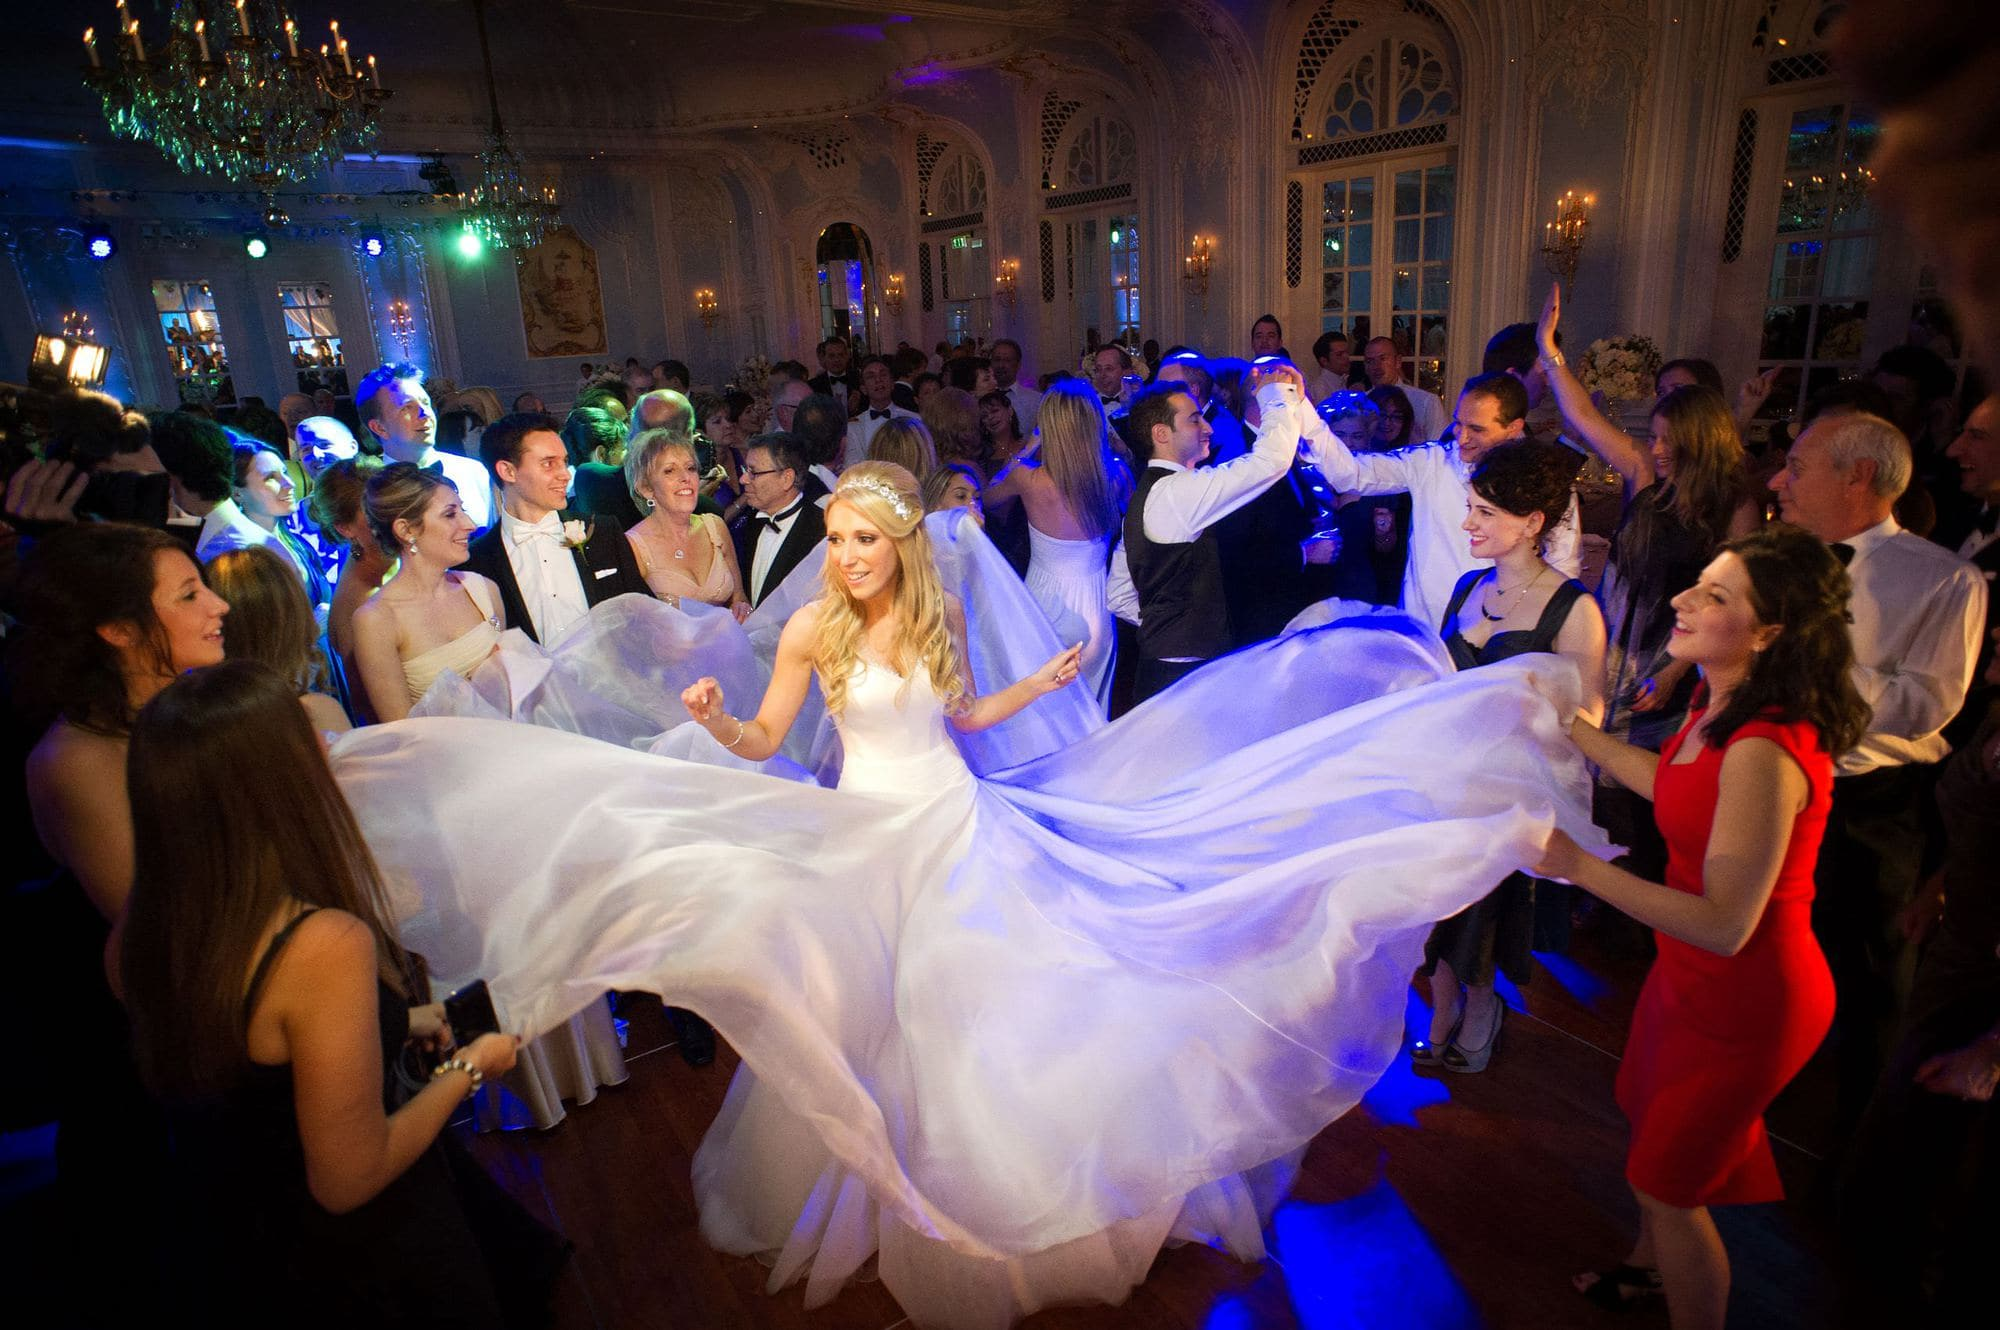 Mark-Seymour-Wedding-Photographer-UK-26 14